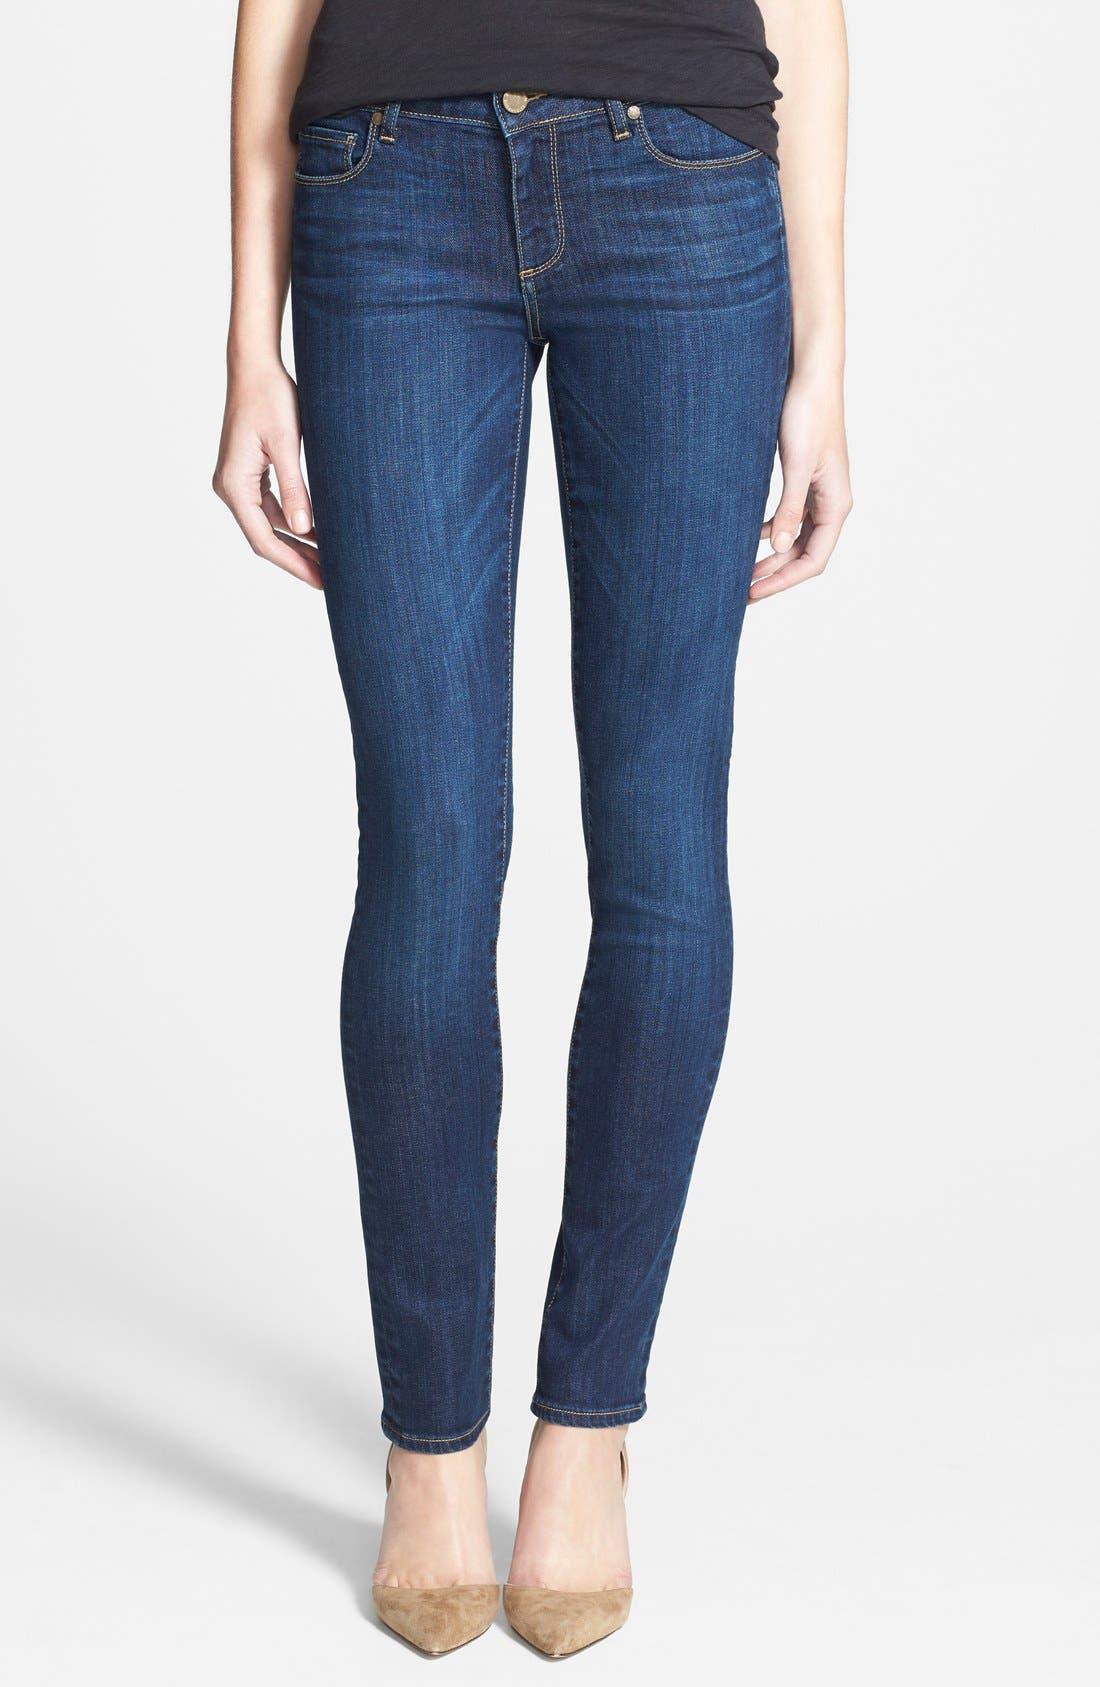 Main Image - Paige Denim 'Skyline' Skinny Jeans (Lange)